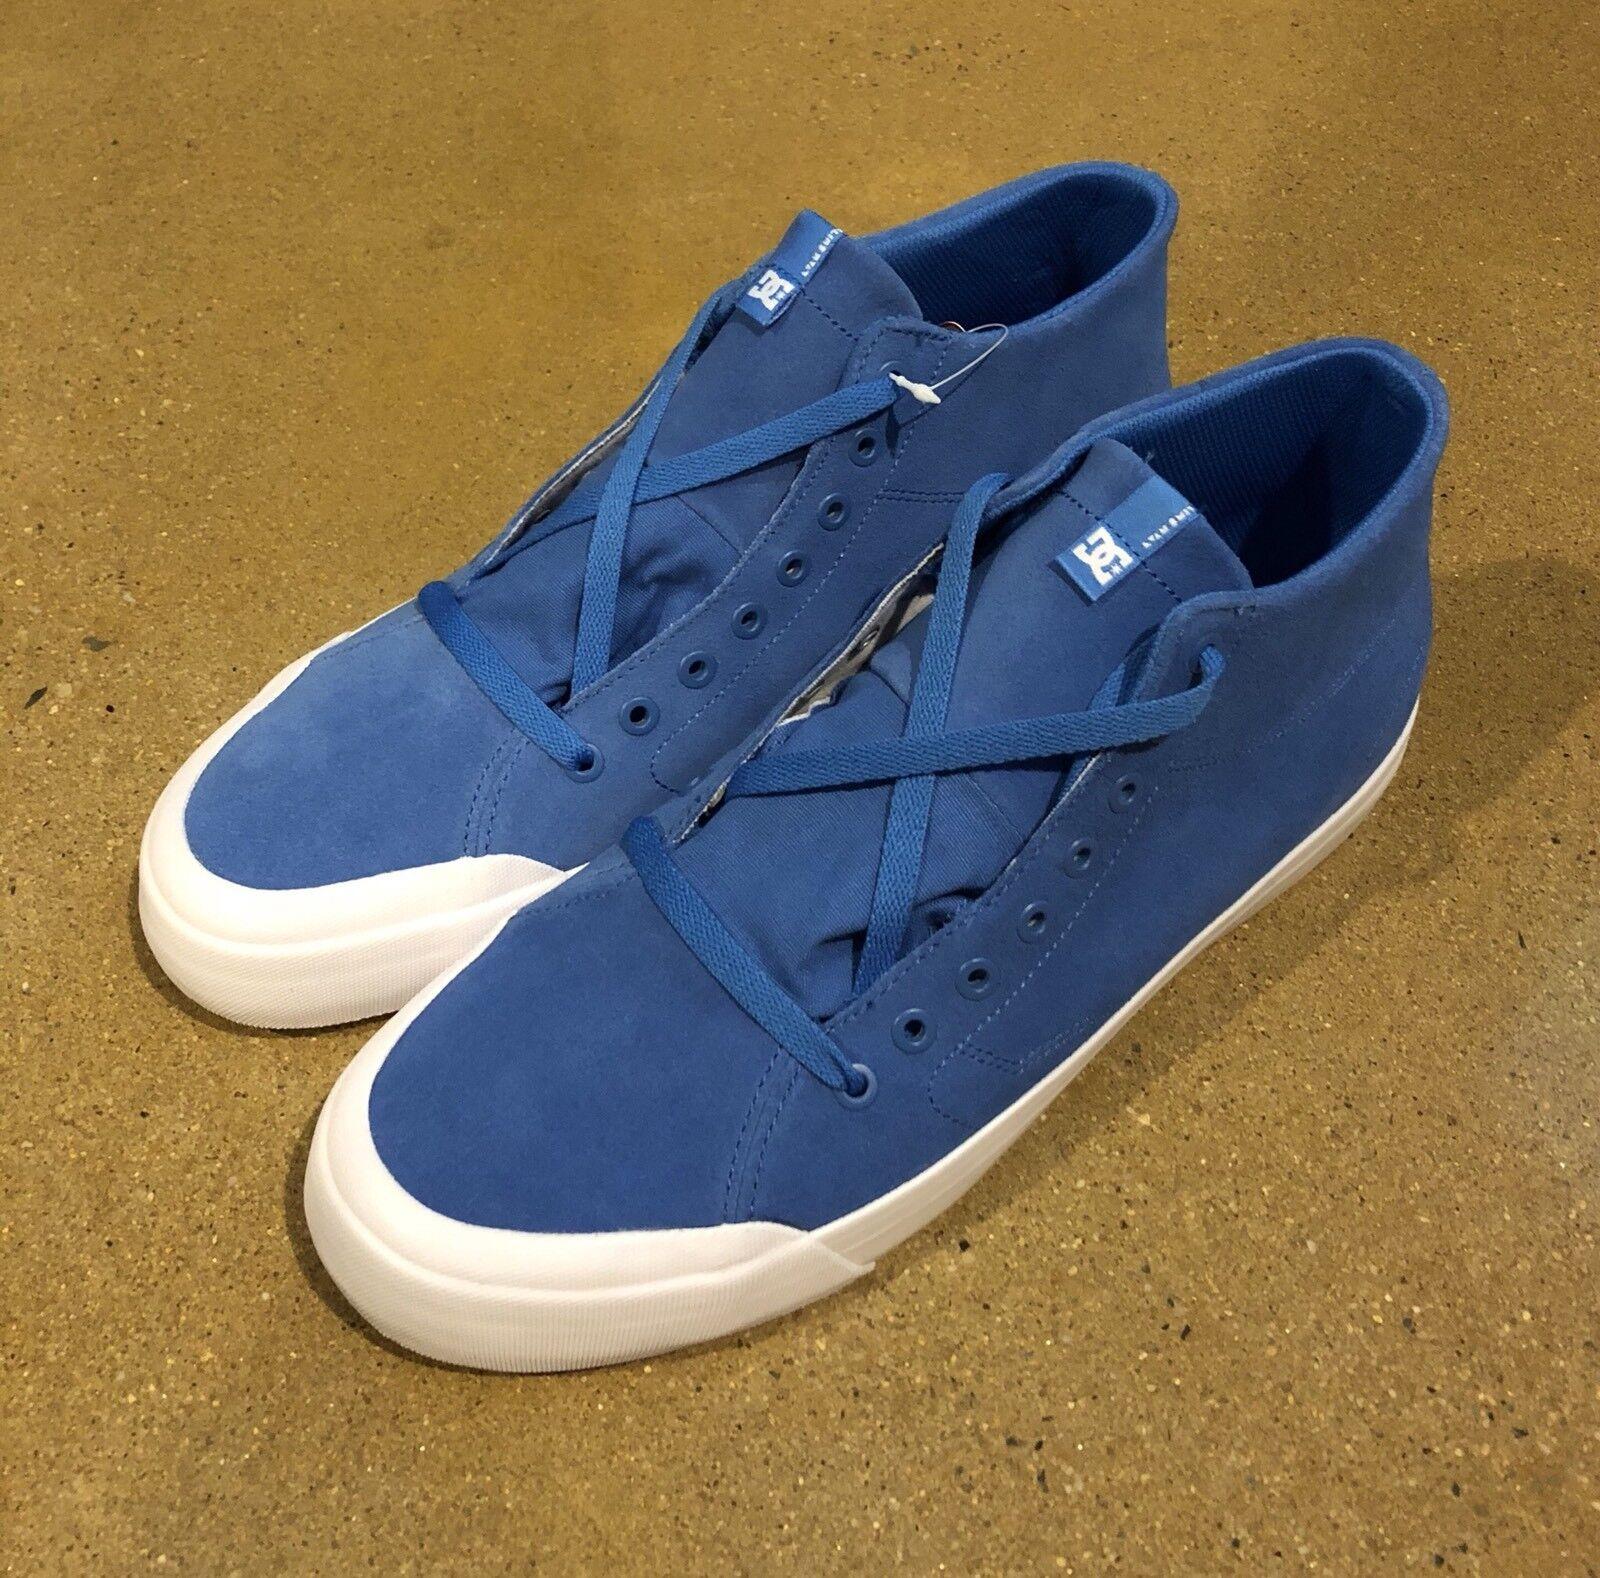 DC Evan Smith HI Zero Blue Uomo's Size 13 US BMX Skate Shoes Scarpe da Ginnastica